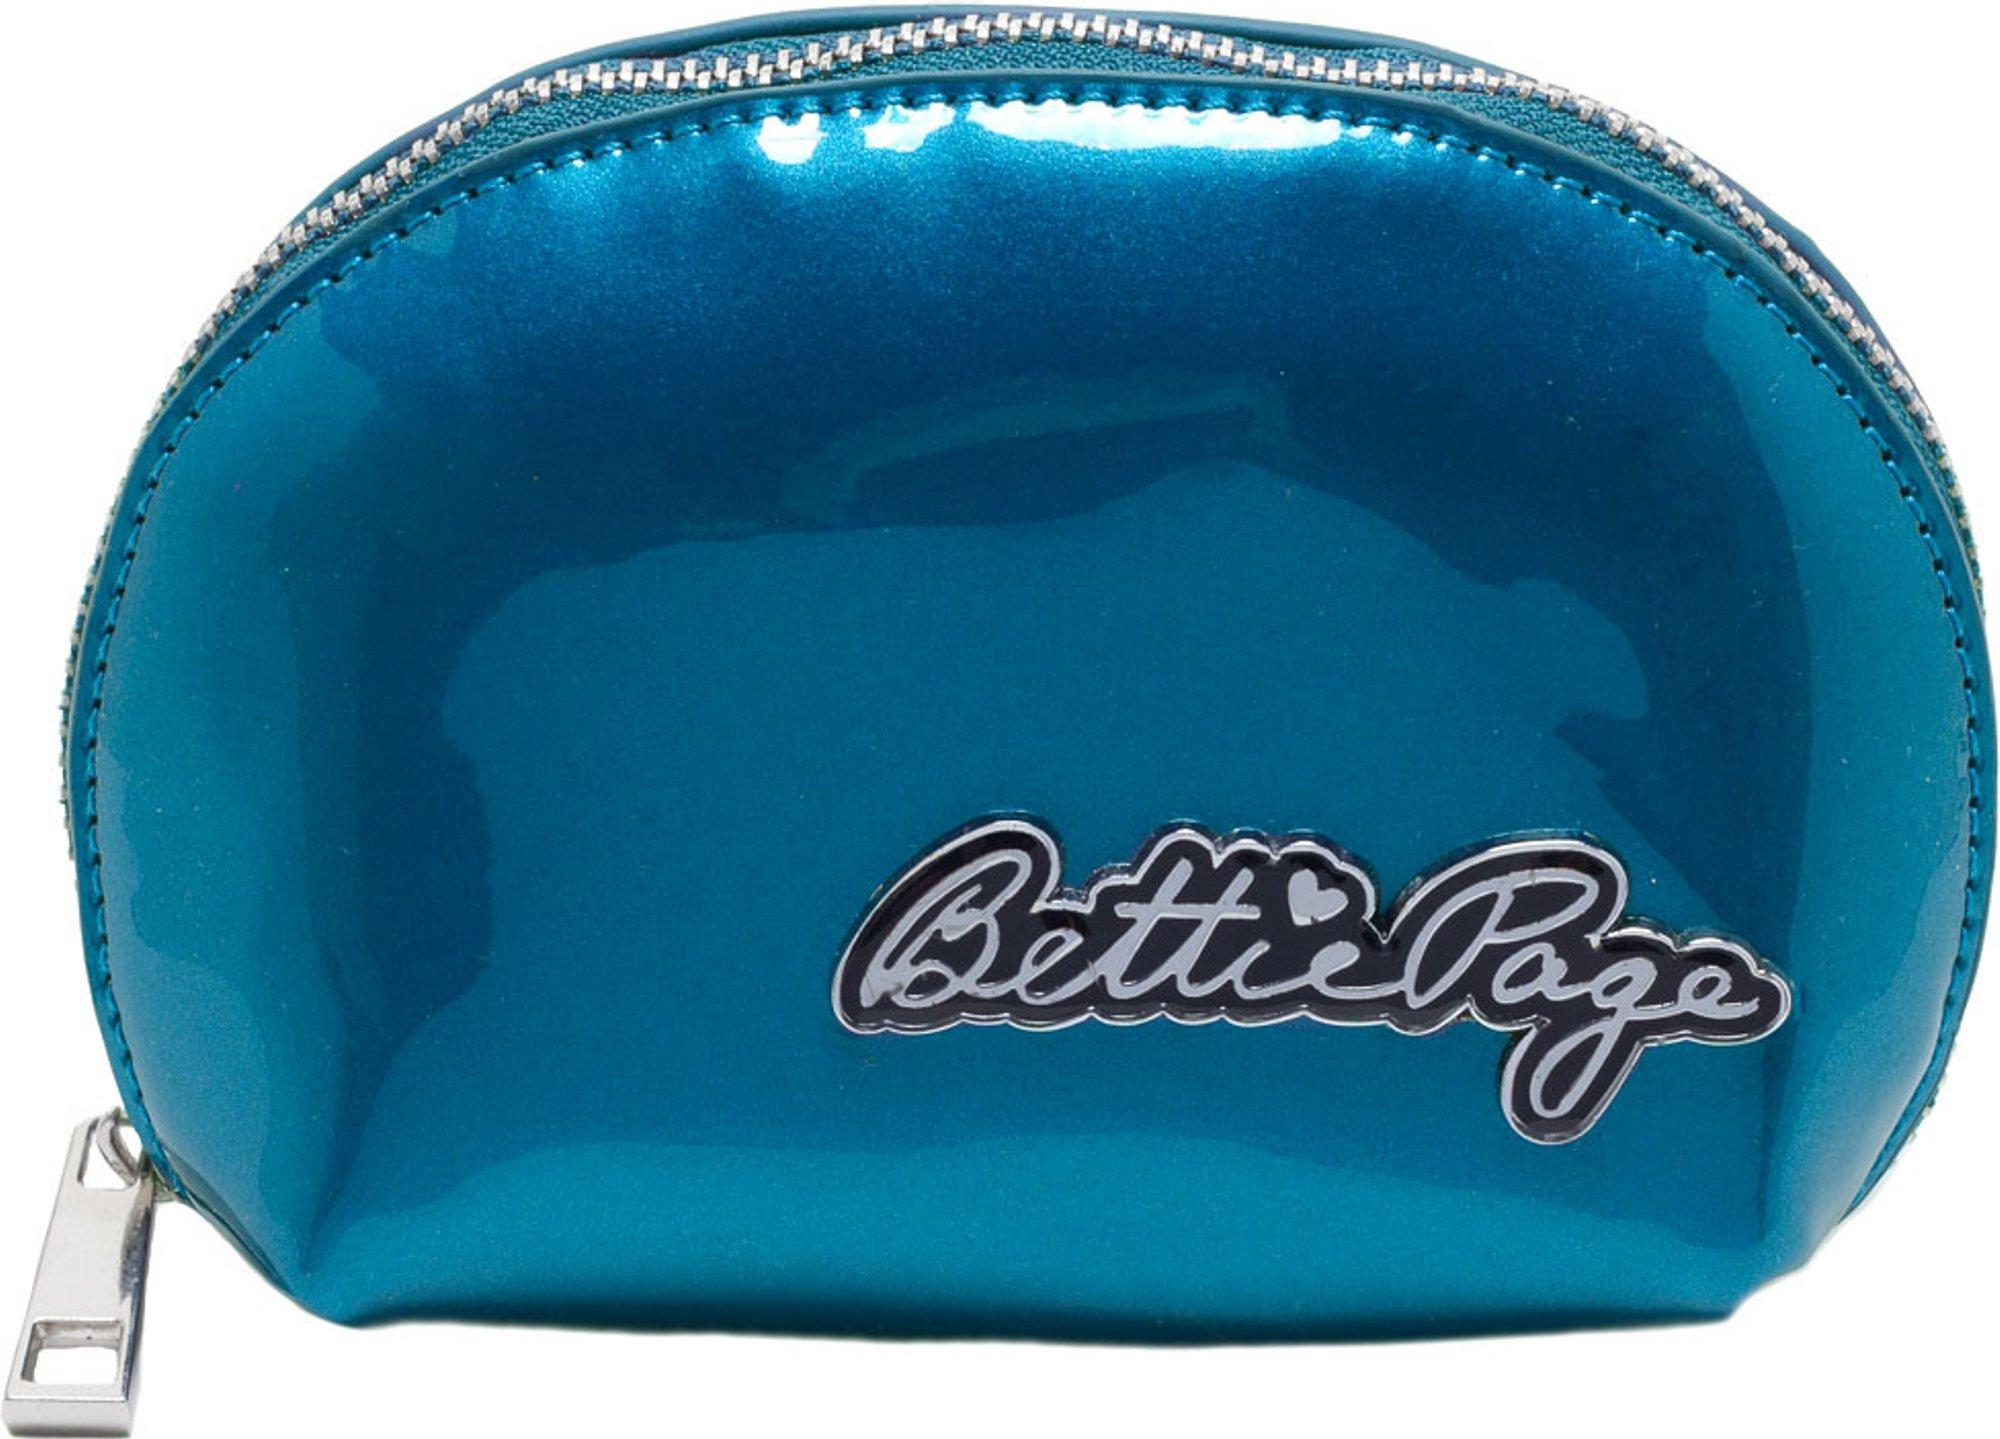 Glossy Blue Bettie Page Makeup Bag - Sourpuss Brand